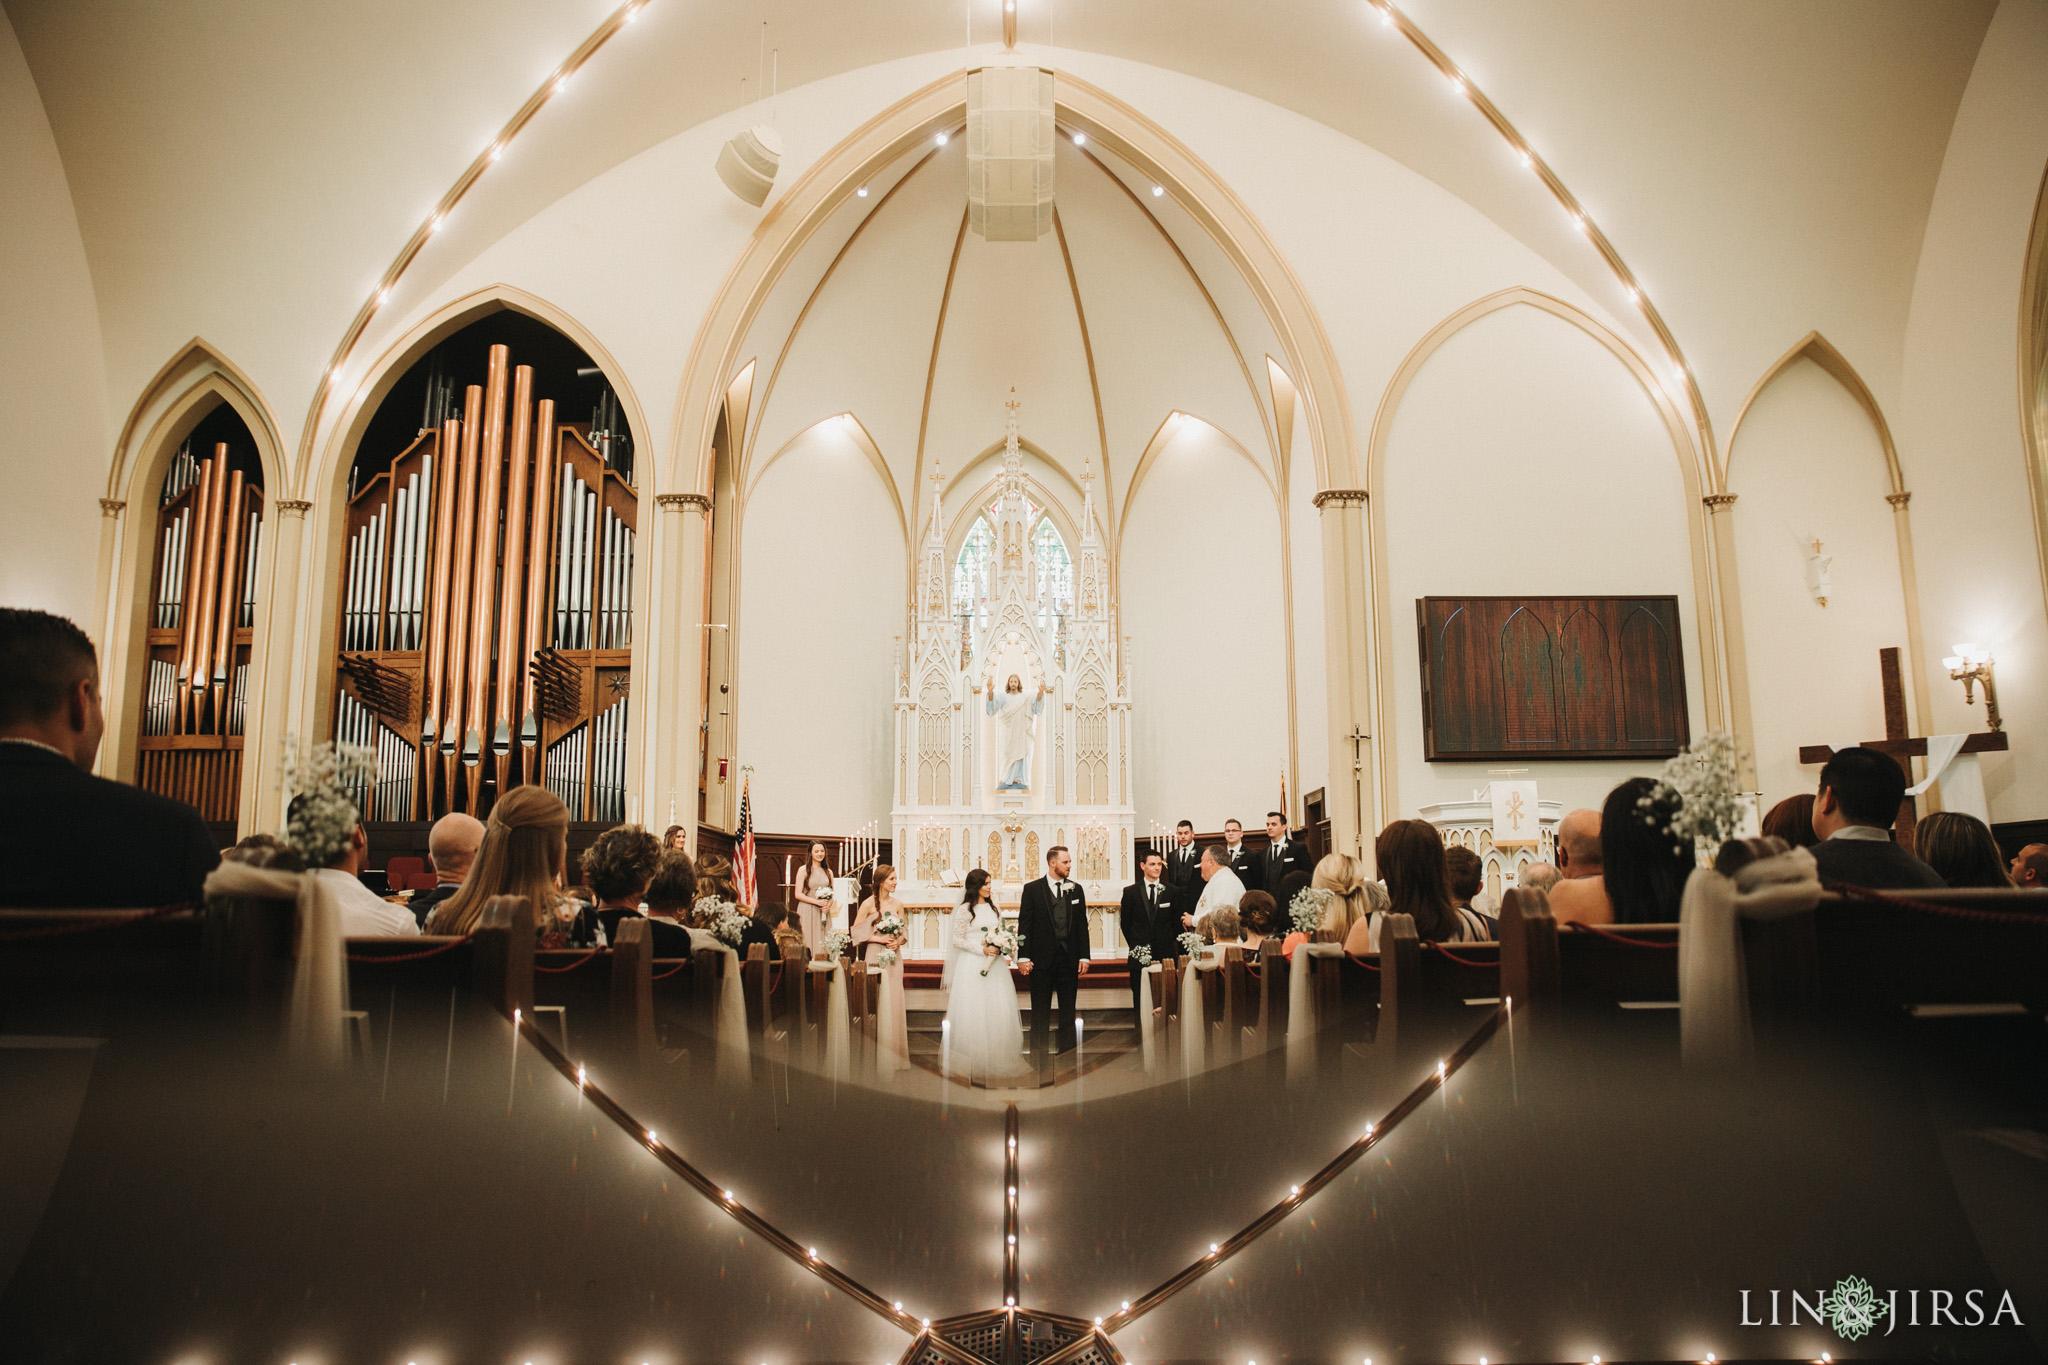 st john lutheran church wedding lin and jirsa photography